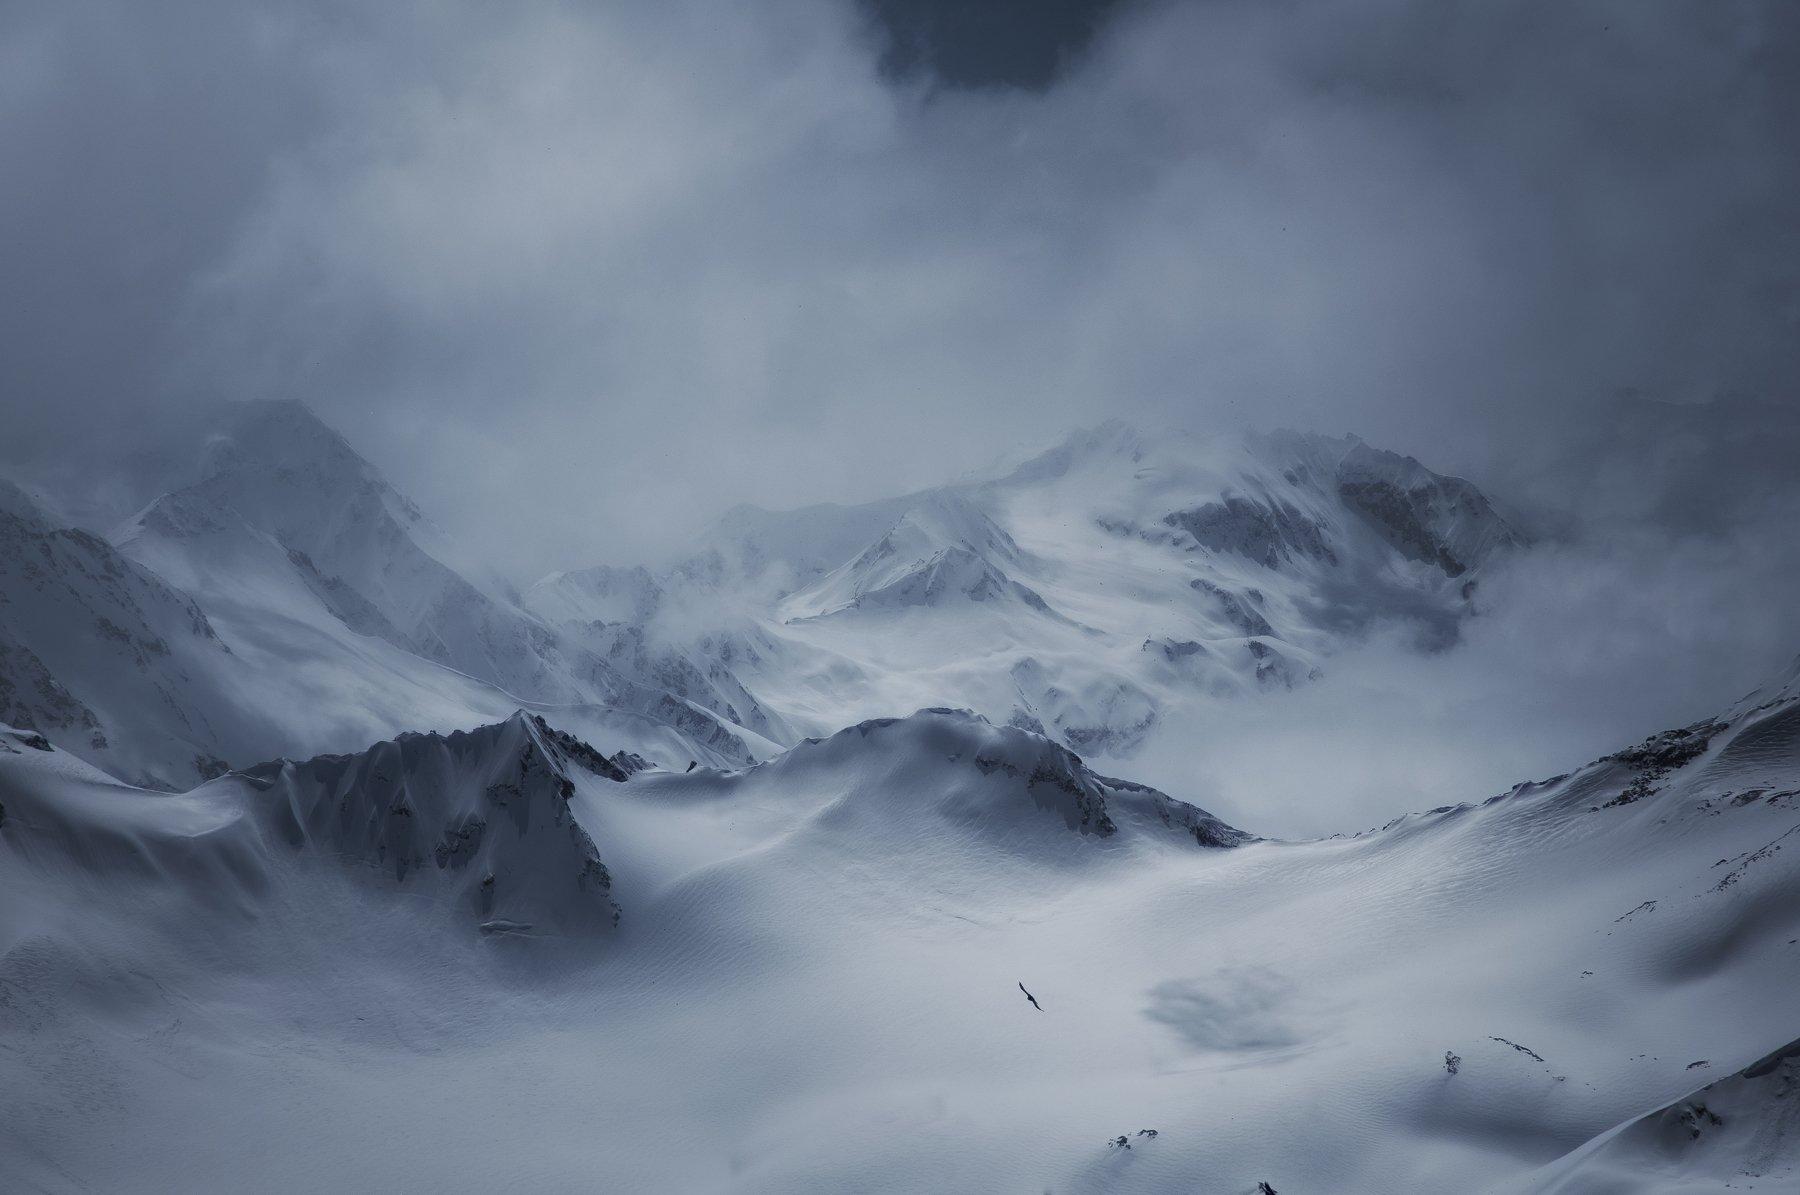 кавказ, горы, туман, путешествия, fog, mountains, travels, Алексей Сергованцев